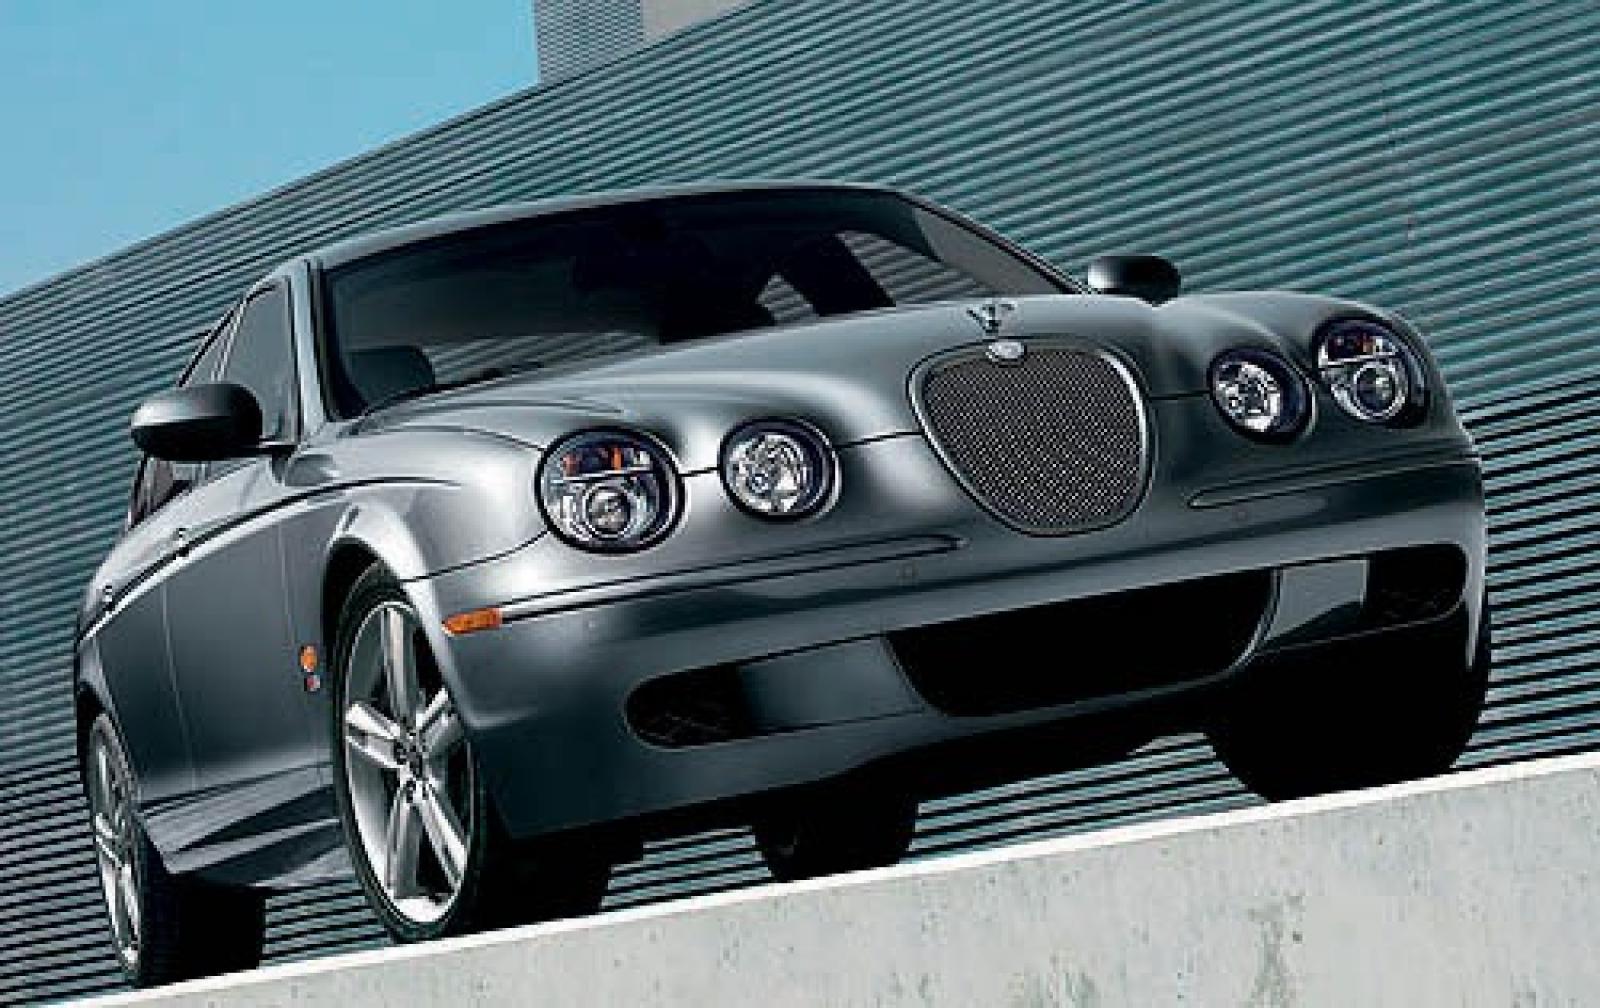 2008 jaguar s type information and photos zombiedrive. Black Bedroom Furniture Sets. Home Design Ideas